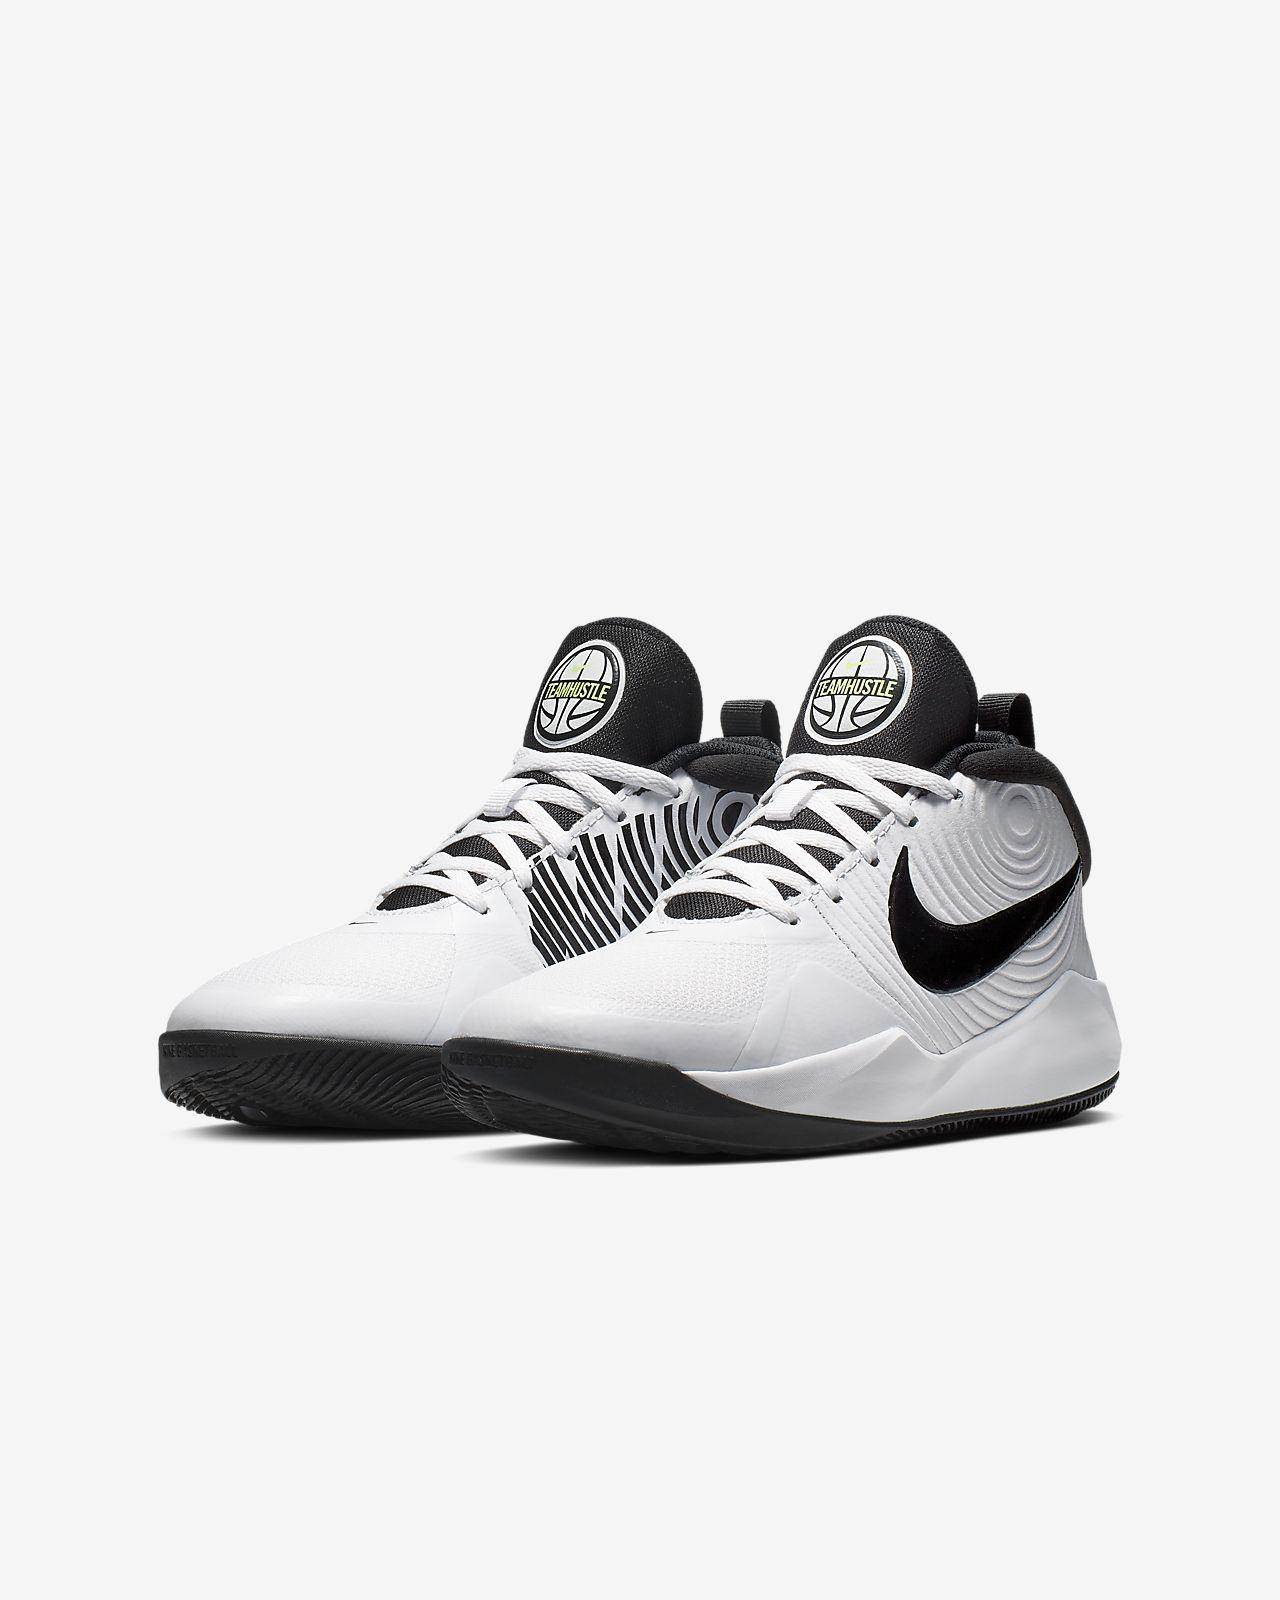 Sapatilhas de basquetebol Nike Team Hustle D 9 Júnior